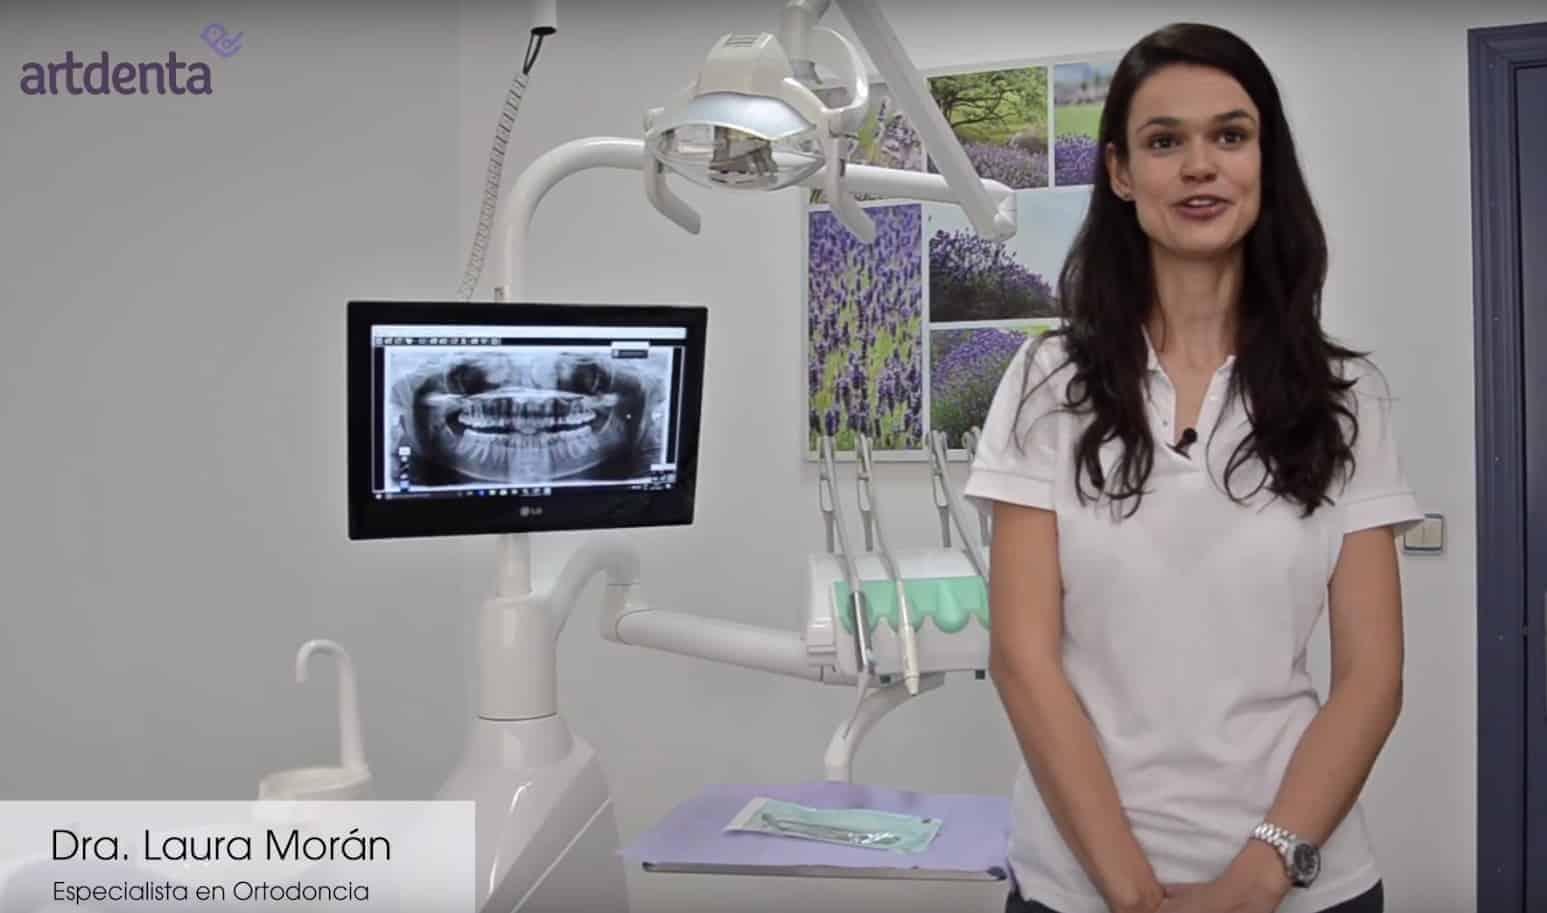 Laura Morán - Clínica Dental en Valencia ARTDENTA